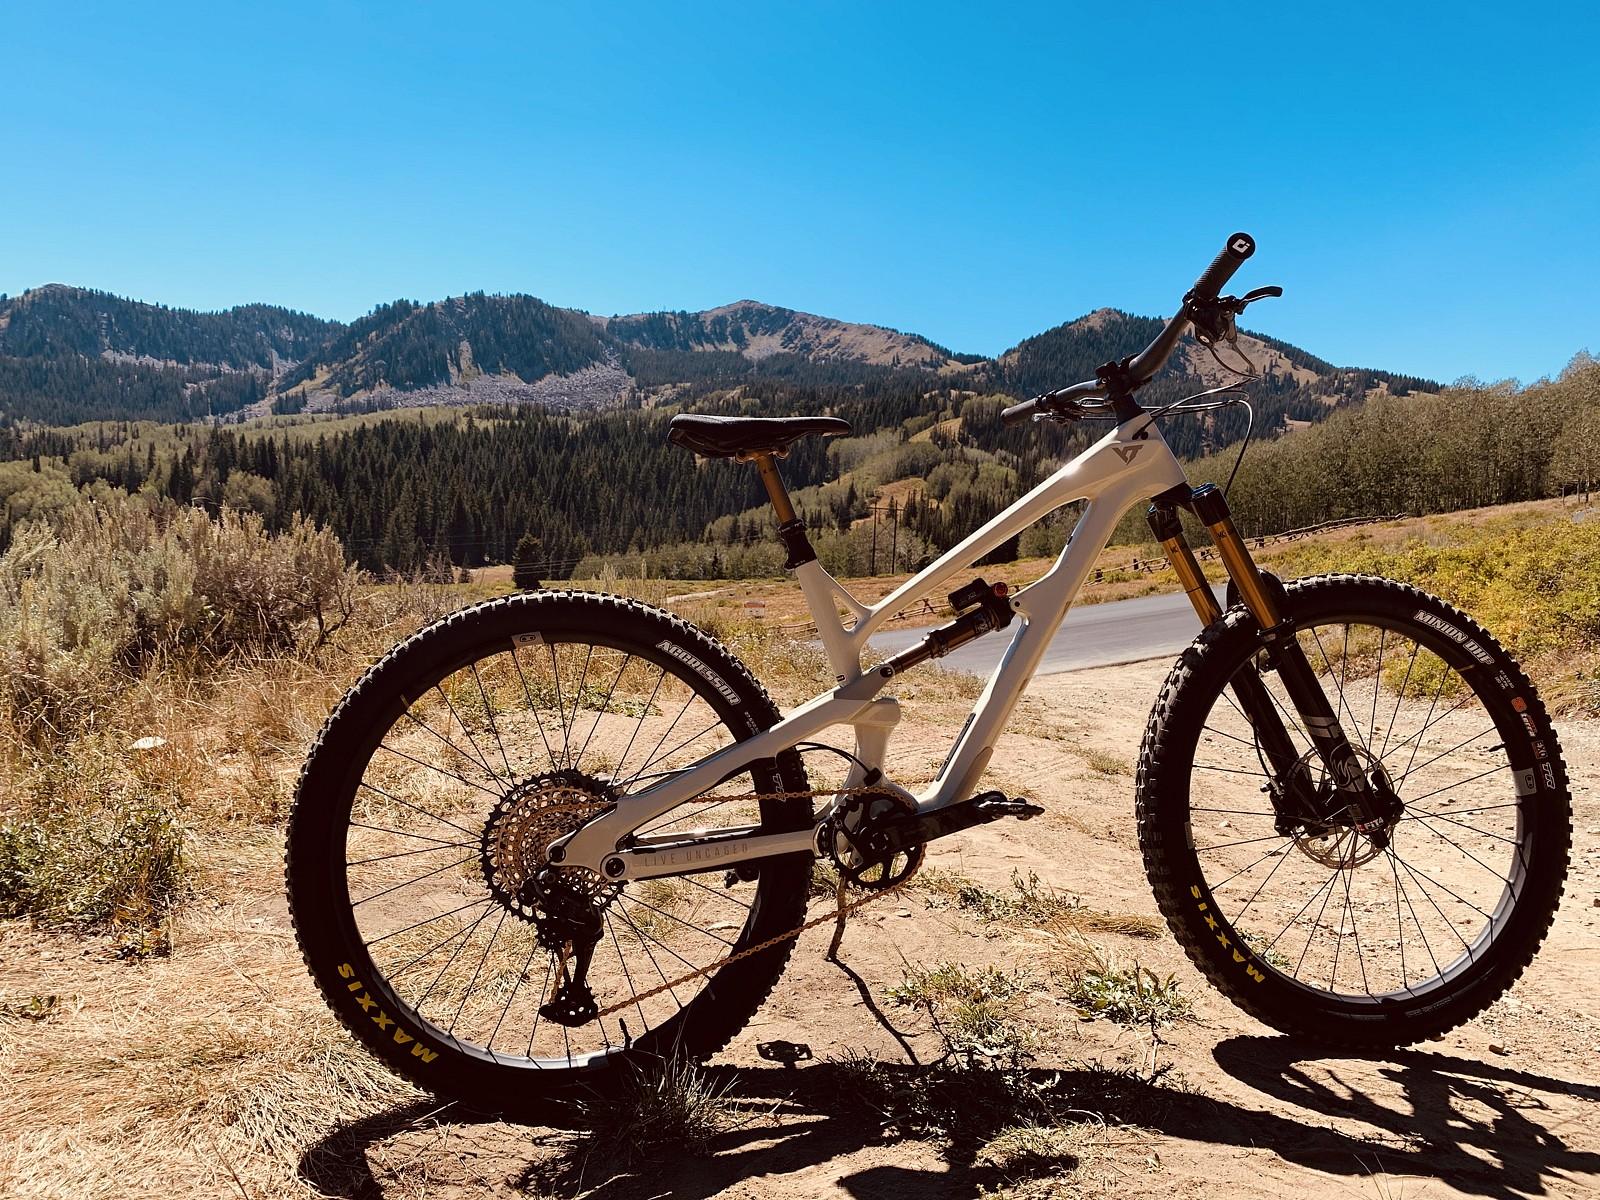 IMG E0205 - jaykalafatis - Mountain Biking Pictures - Vital MTB